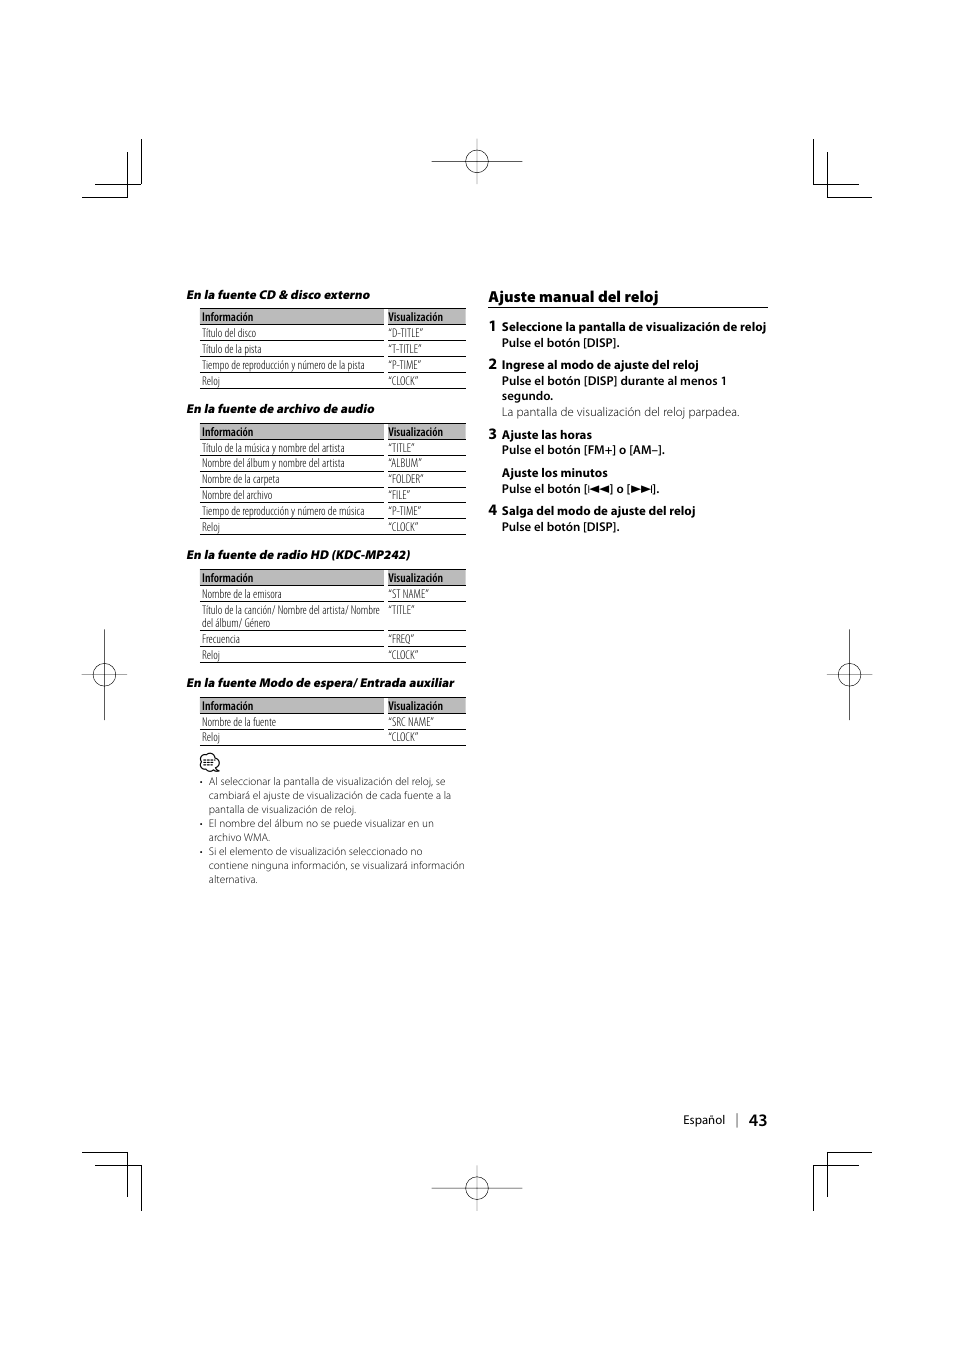 kenwood kdc mp142 wiring diagram 2 2001 dodge neon starter manual schematic ajuste del reloj 1 user page 43 148